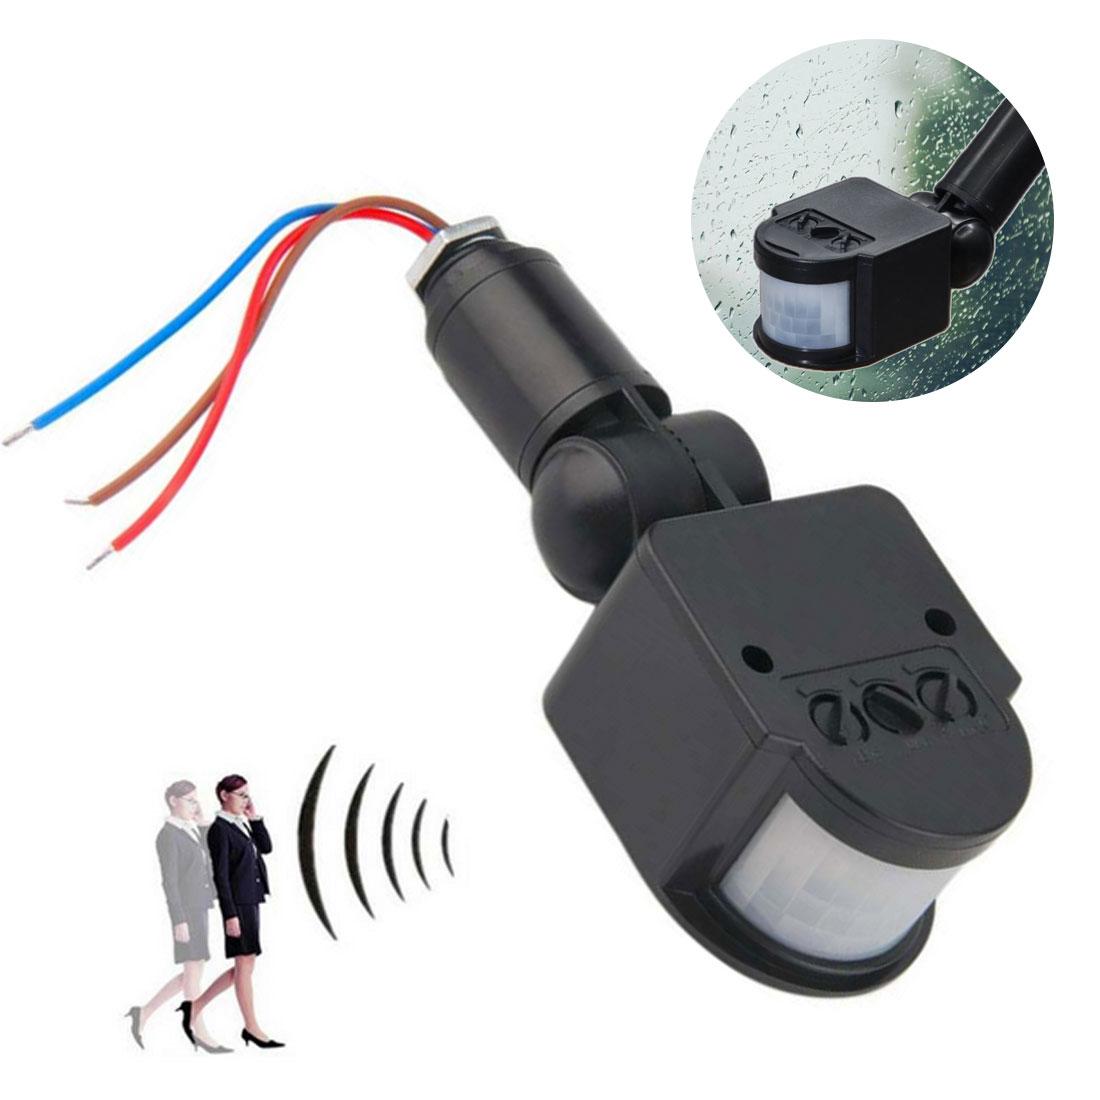 Infrared Body Sensor LED Motion Sensor Automatic Infrared PIR Movement Detector Light-Switch Outdoor Wall Mount Sensor